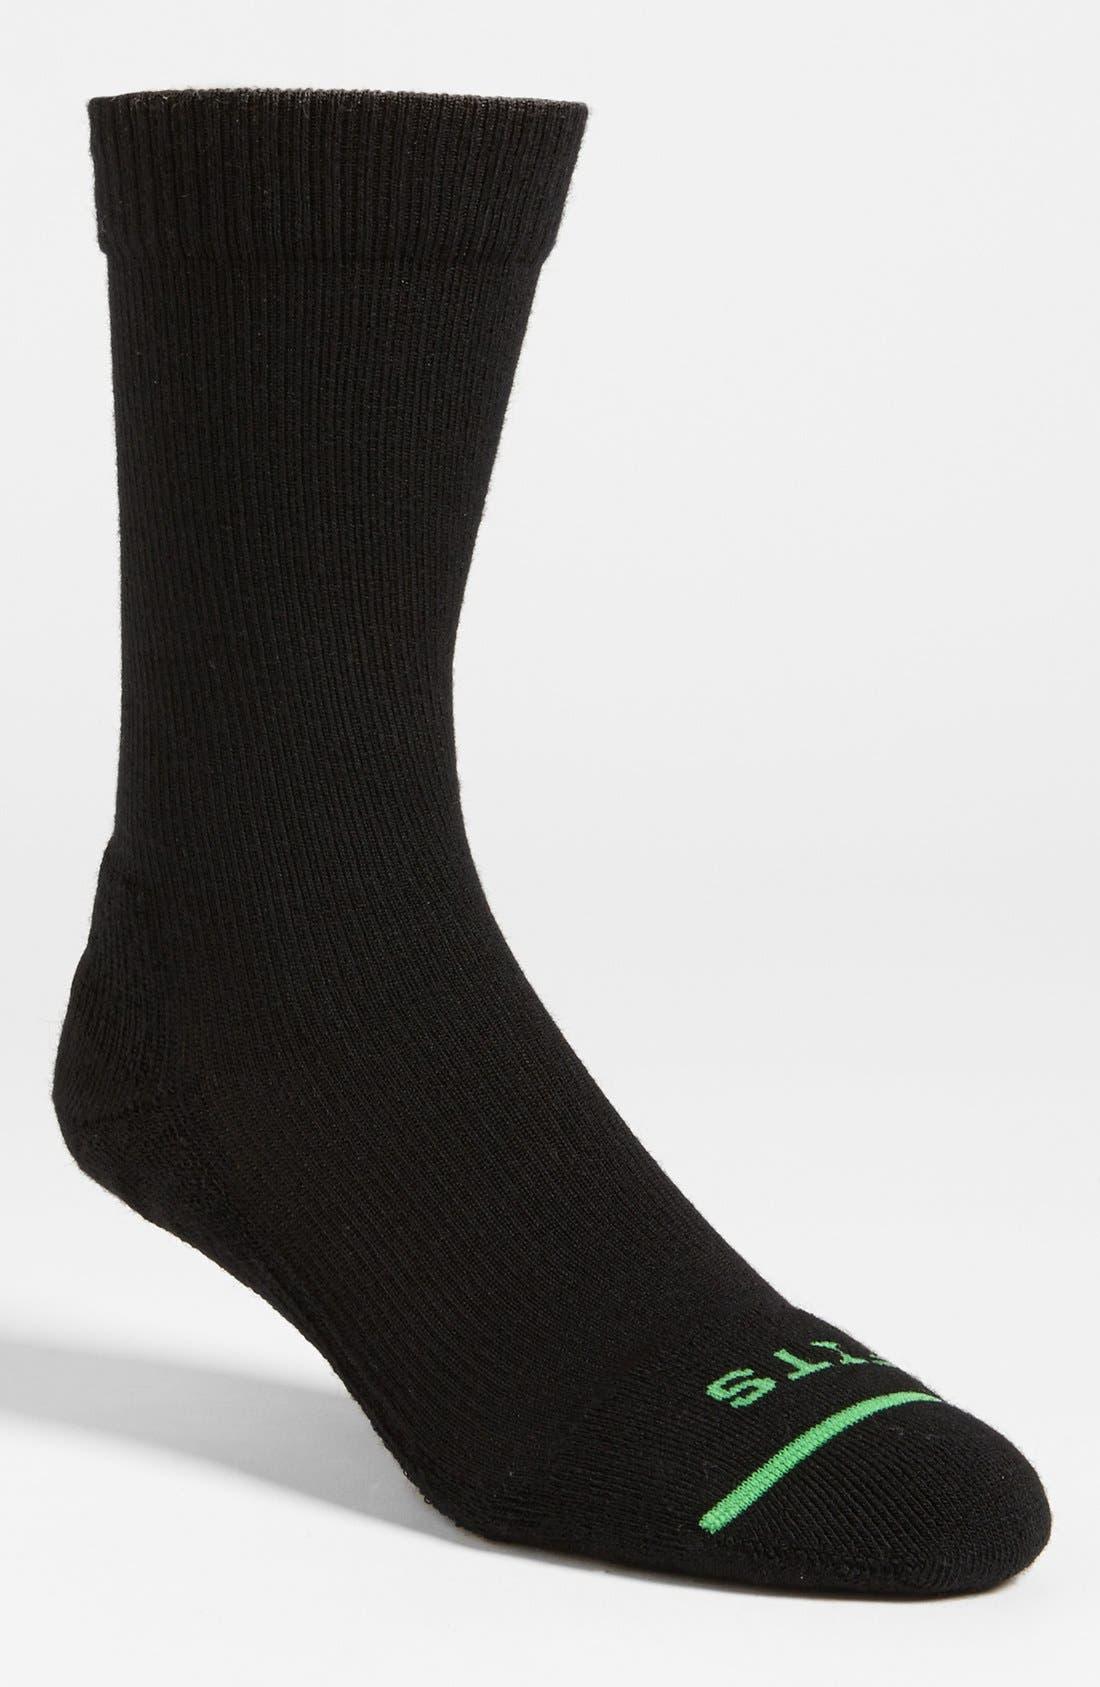 Co. Crew Socks,                             Main thumbnail 1, color,                             001